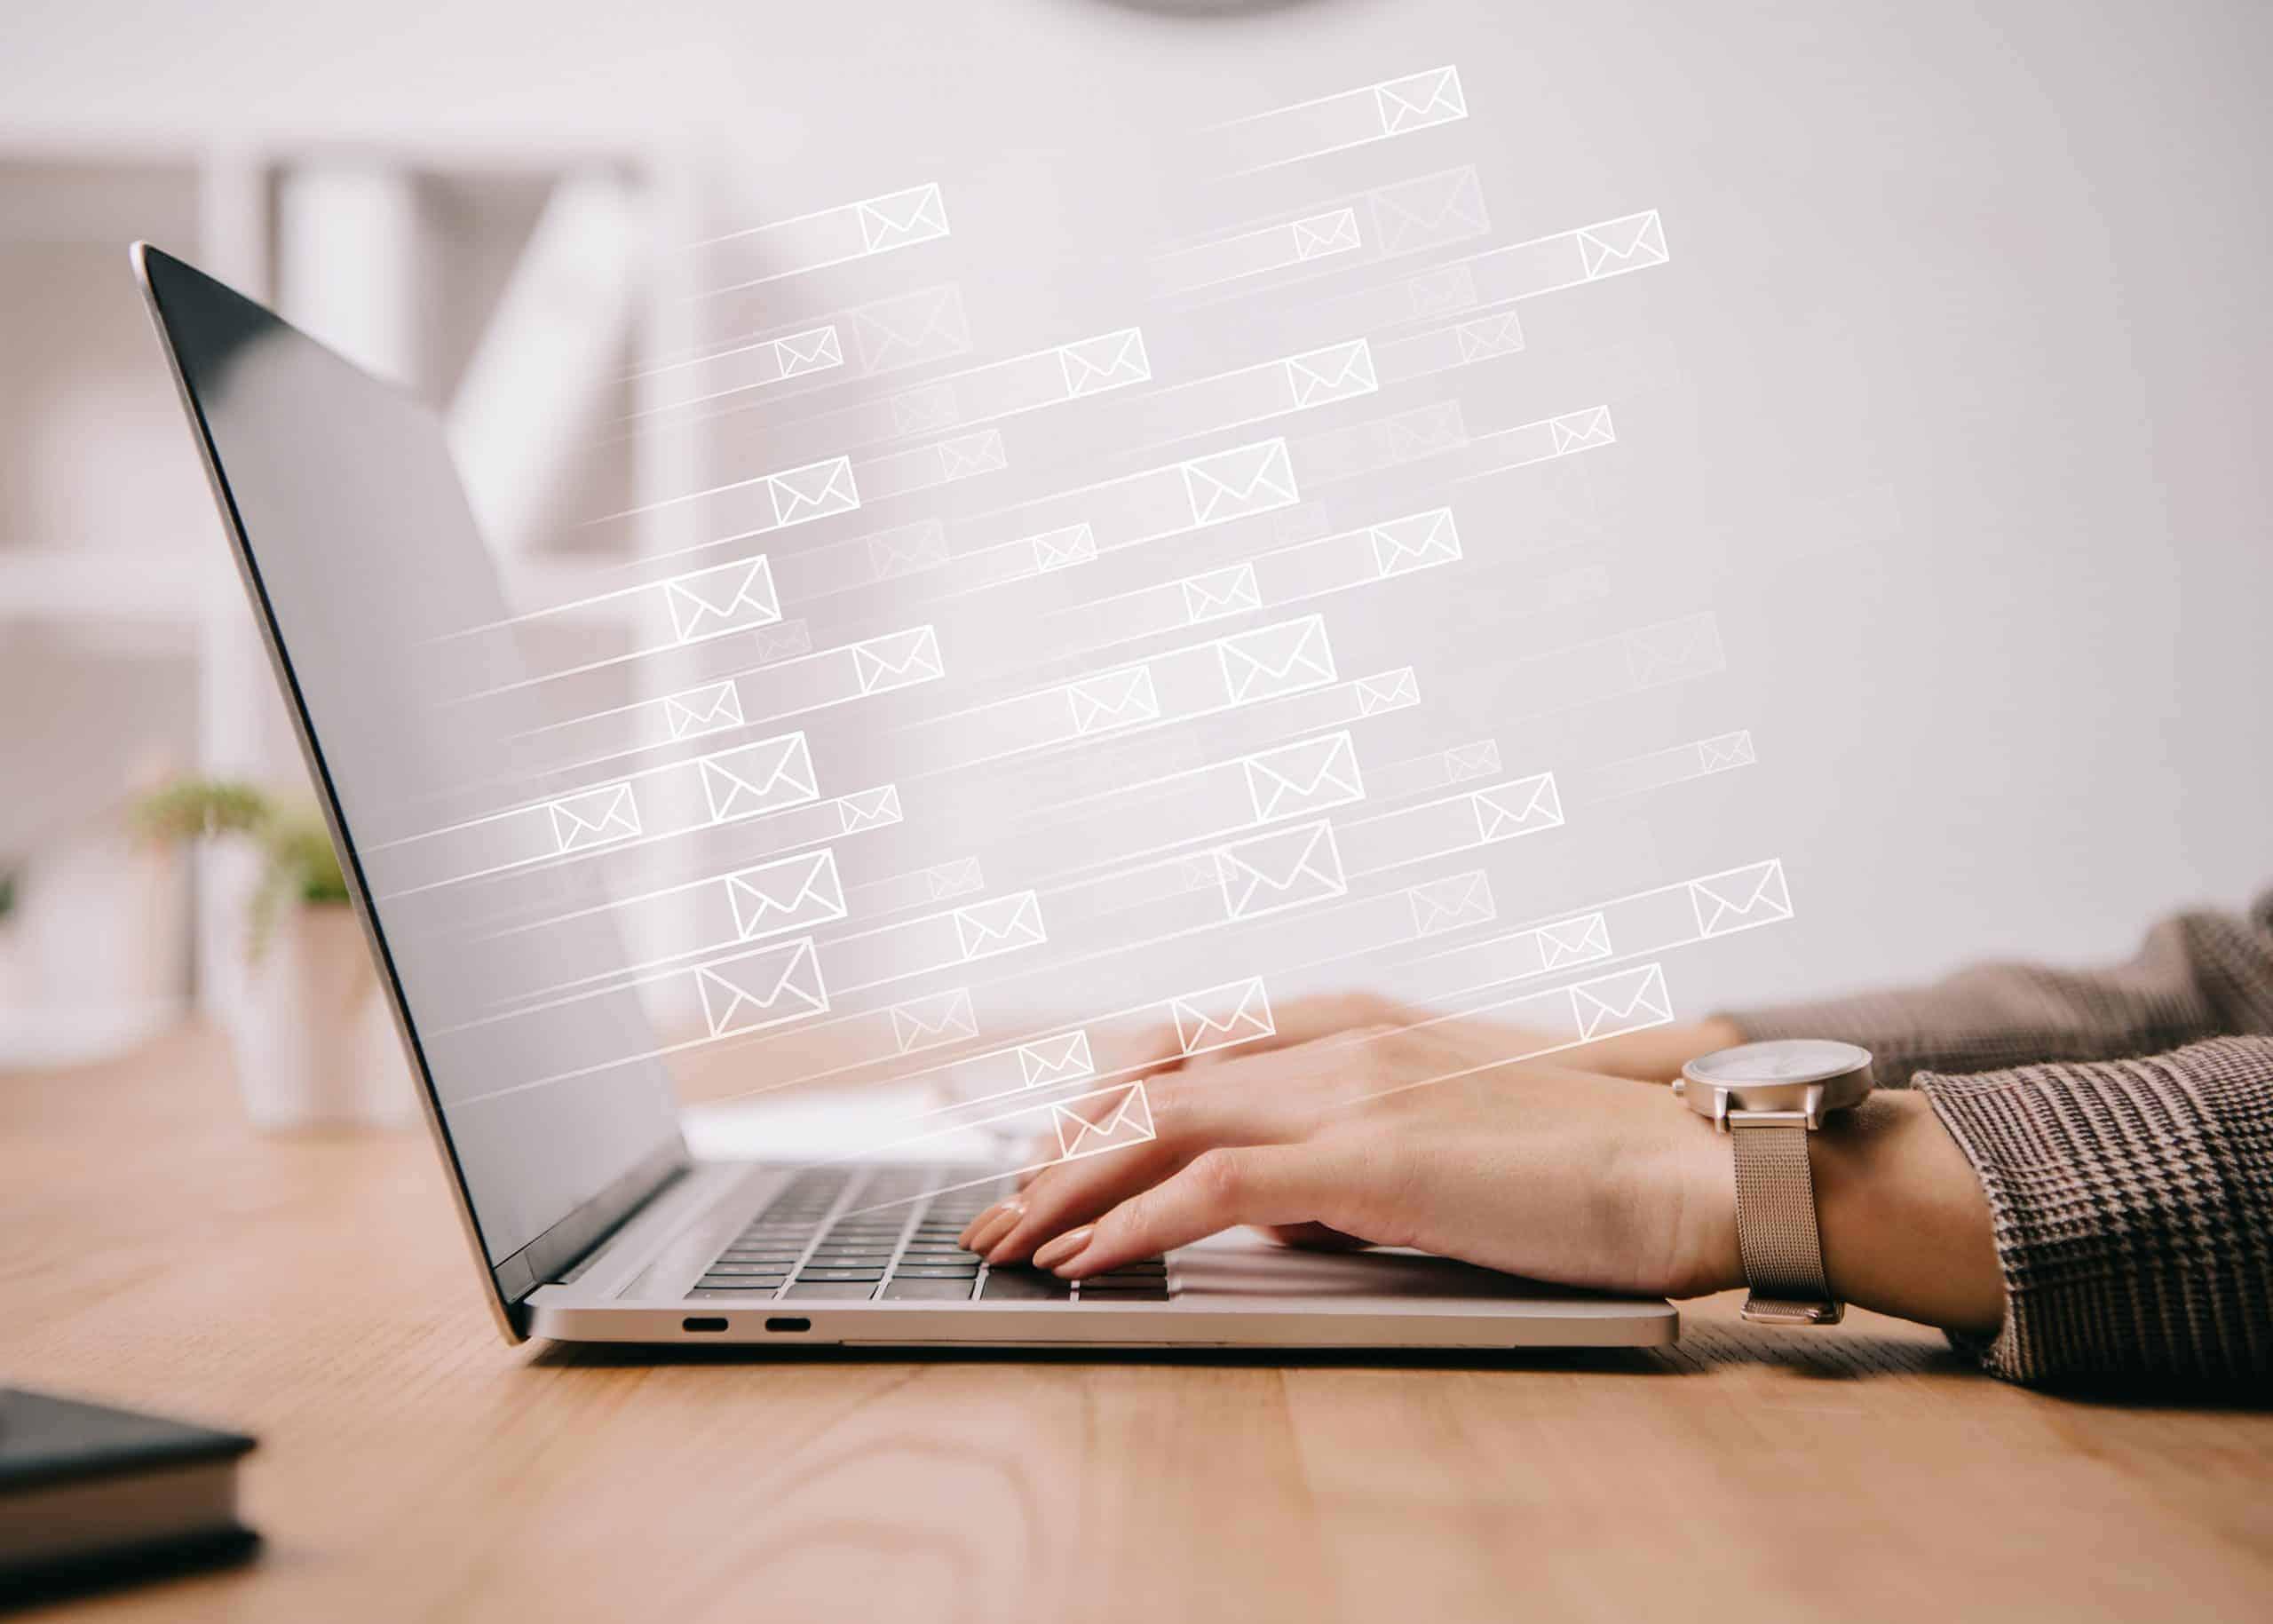 email management software hands laptop